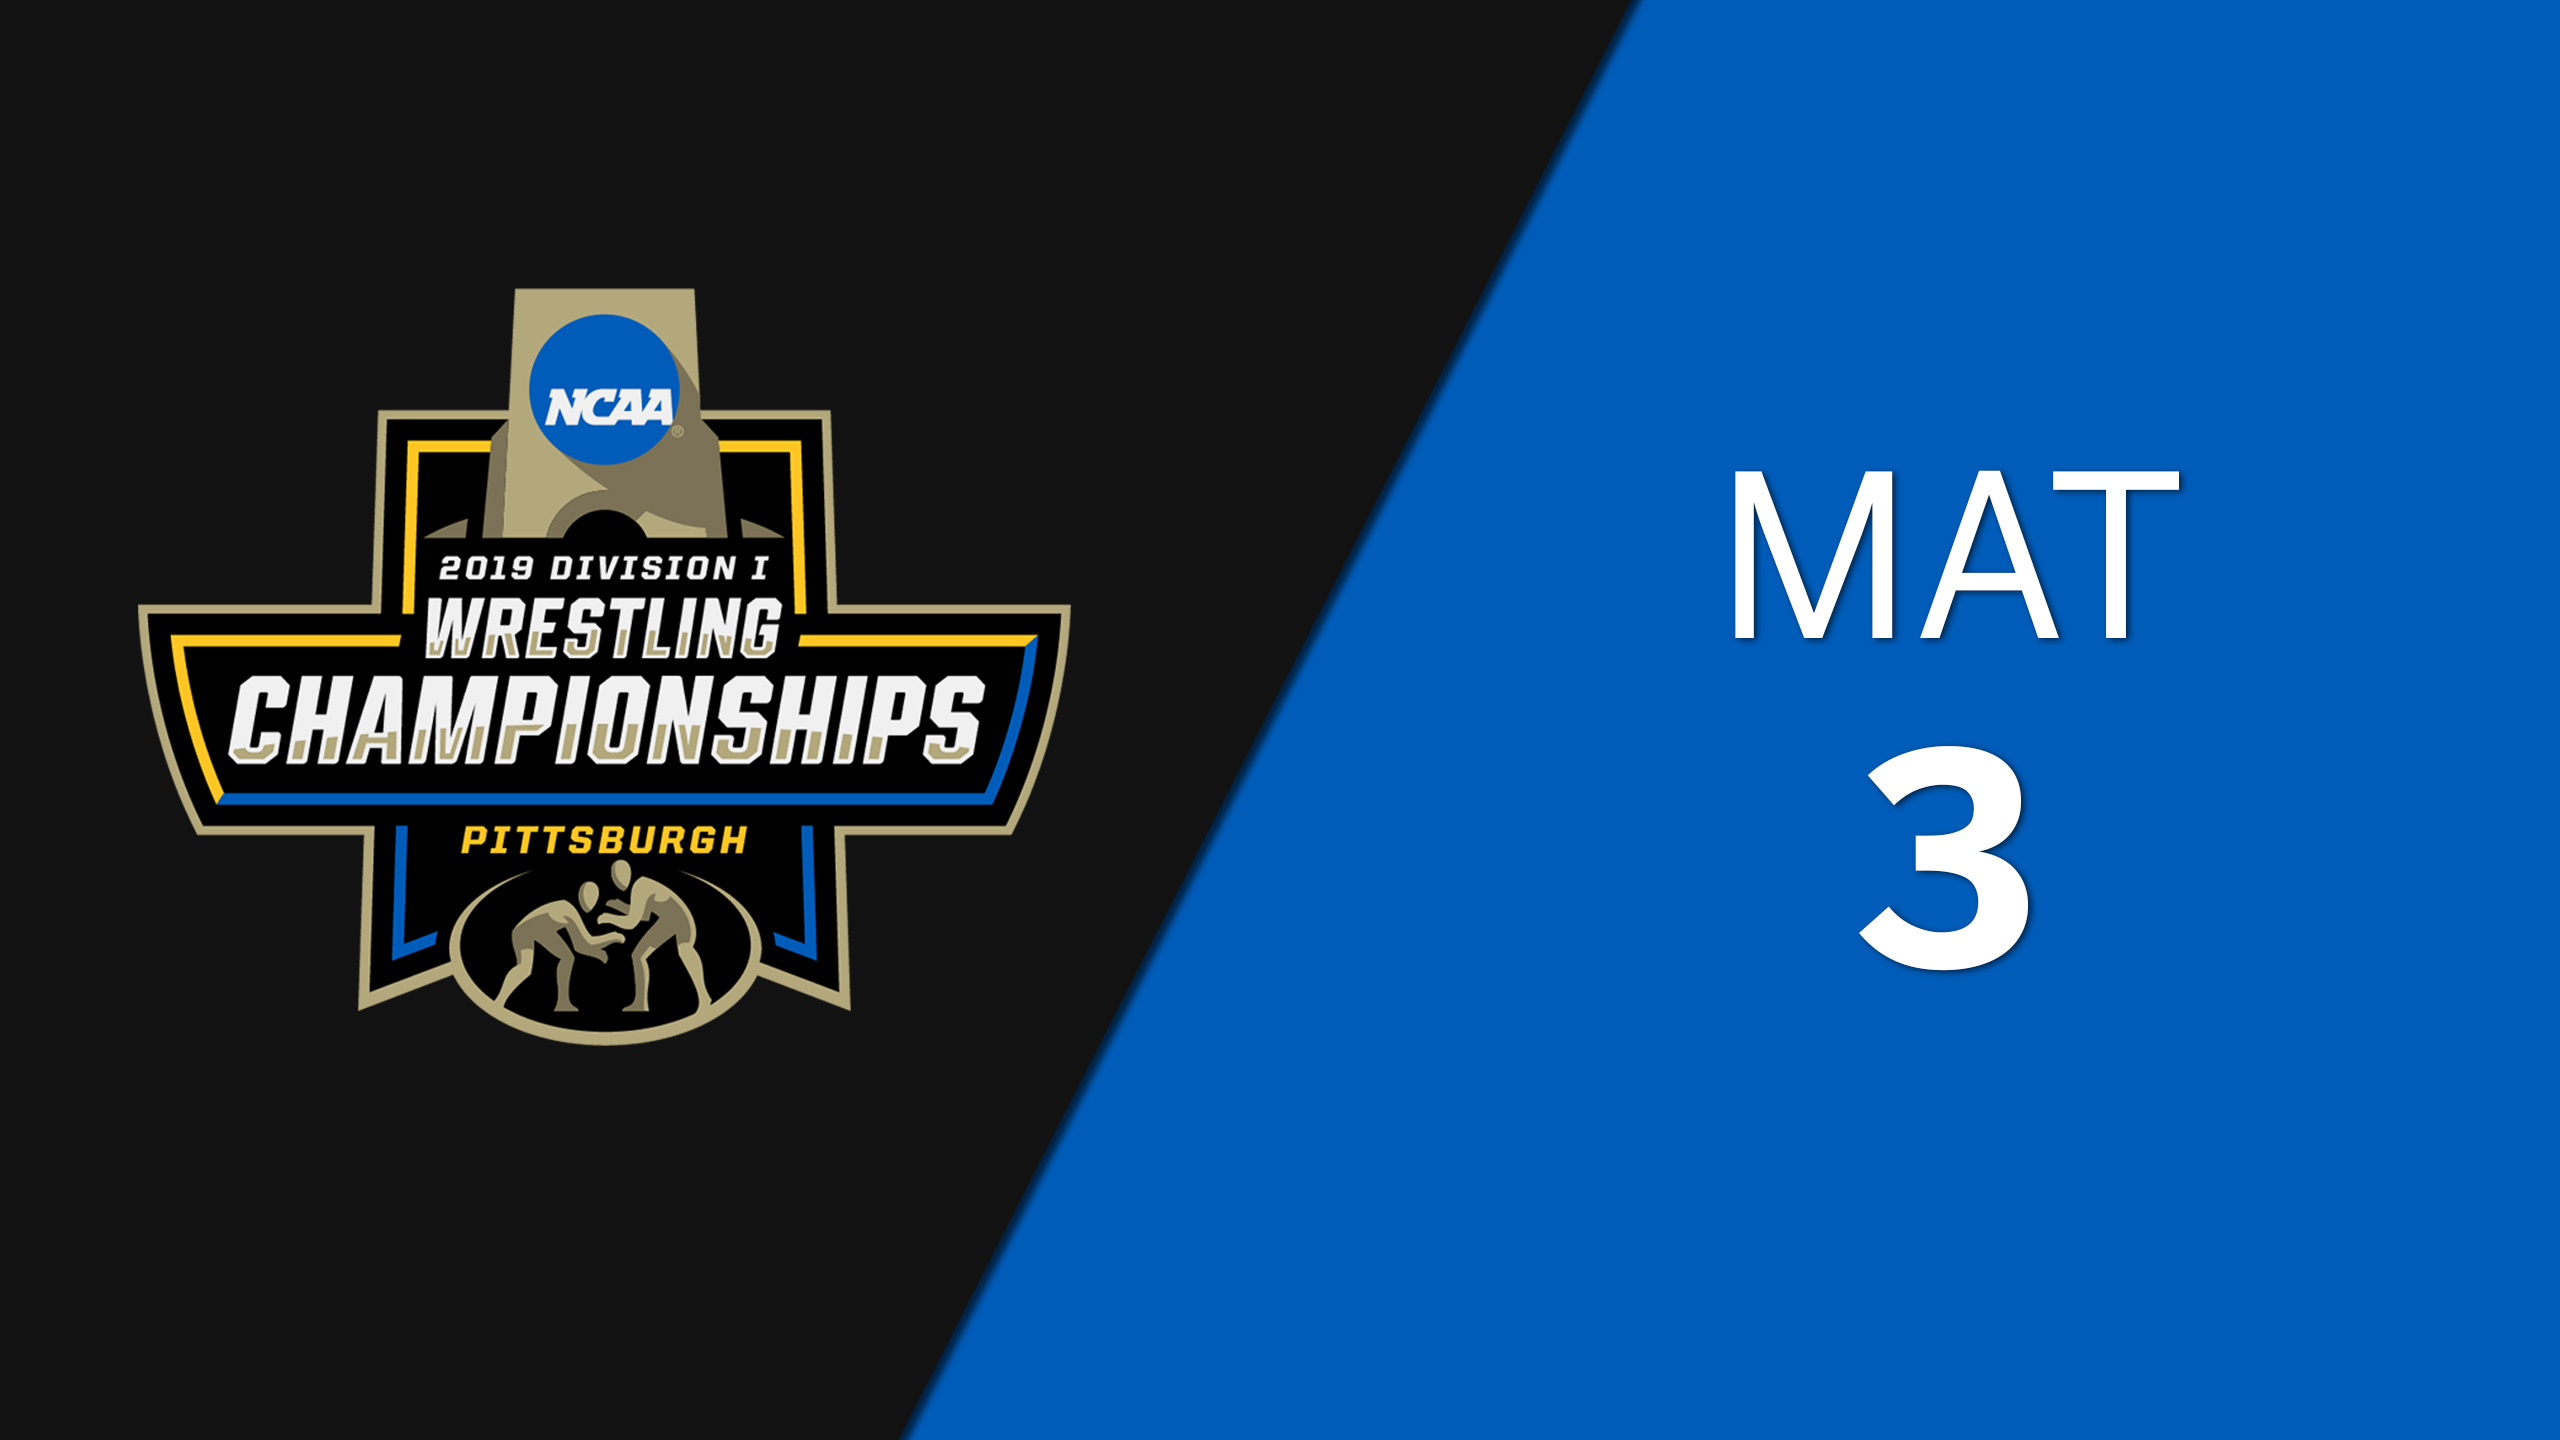 NCAA Wrestling Championship (Mat 3, Quarterfinals)